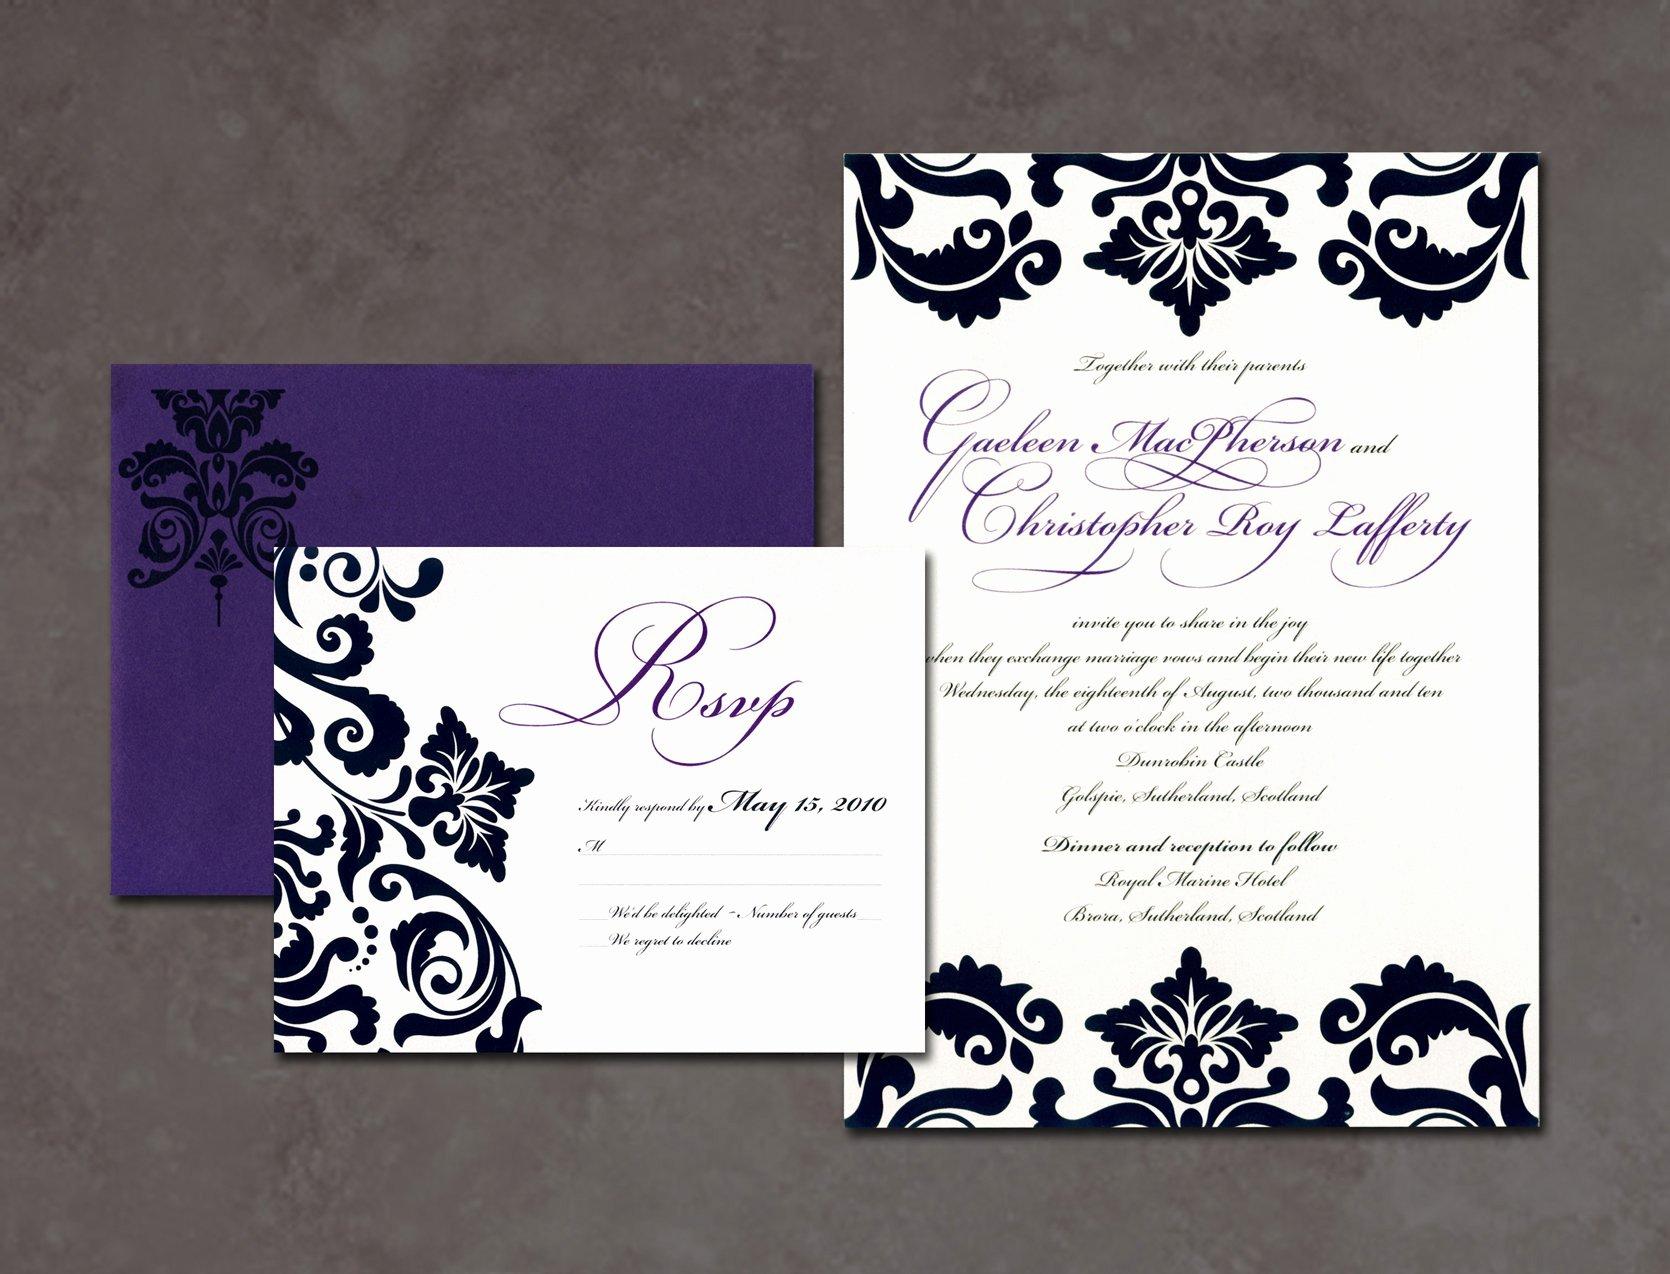 Wedding Invitations Photoshop Template Elegant Wedding Invitation Free Wedding Invitation Templates